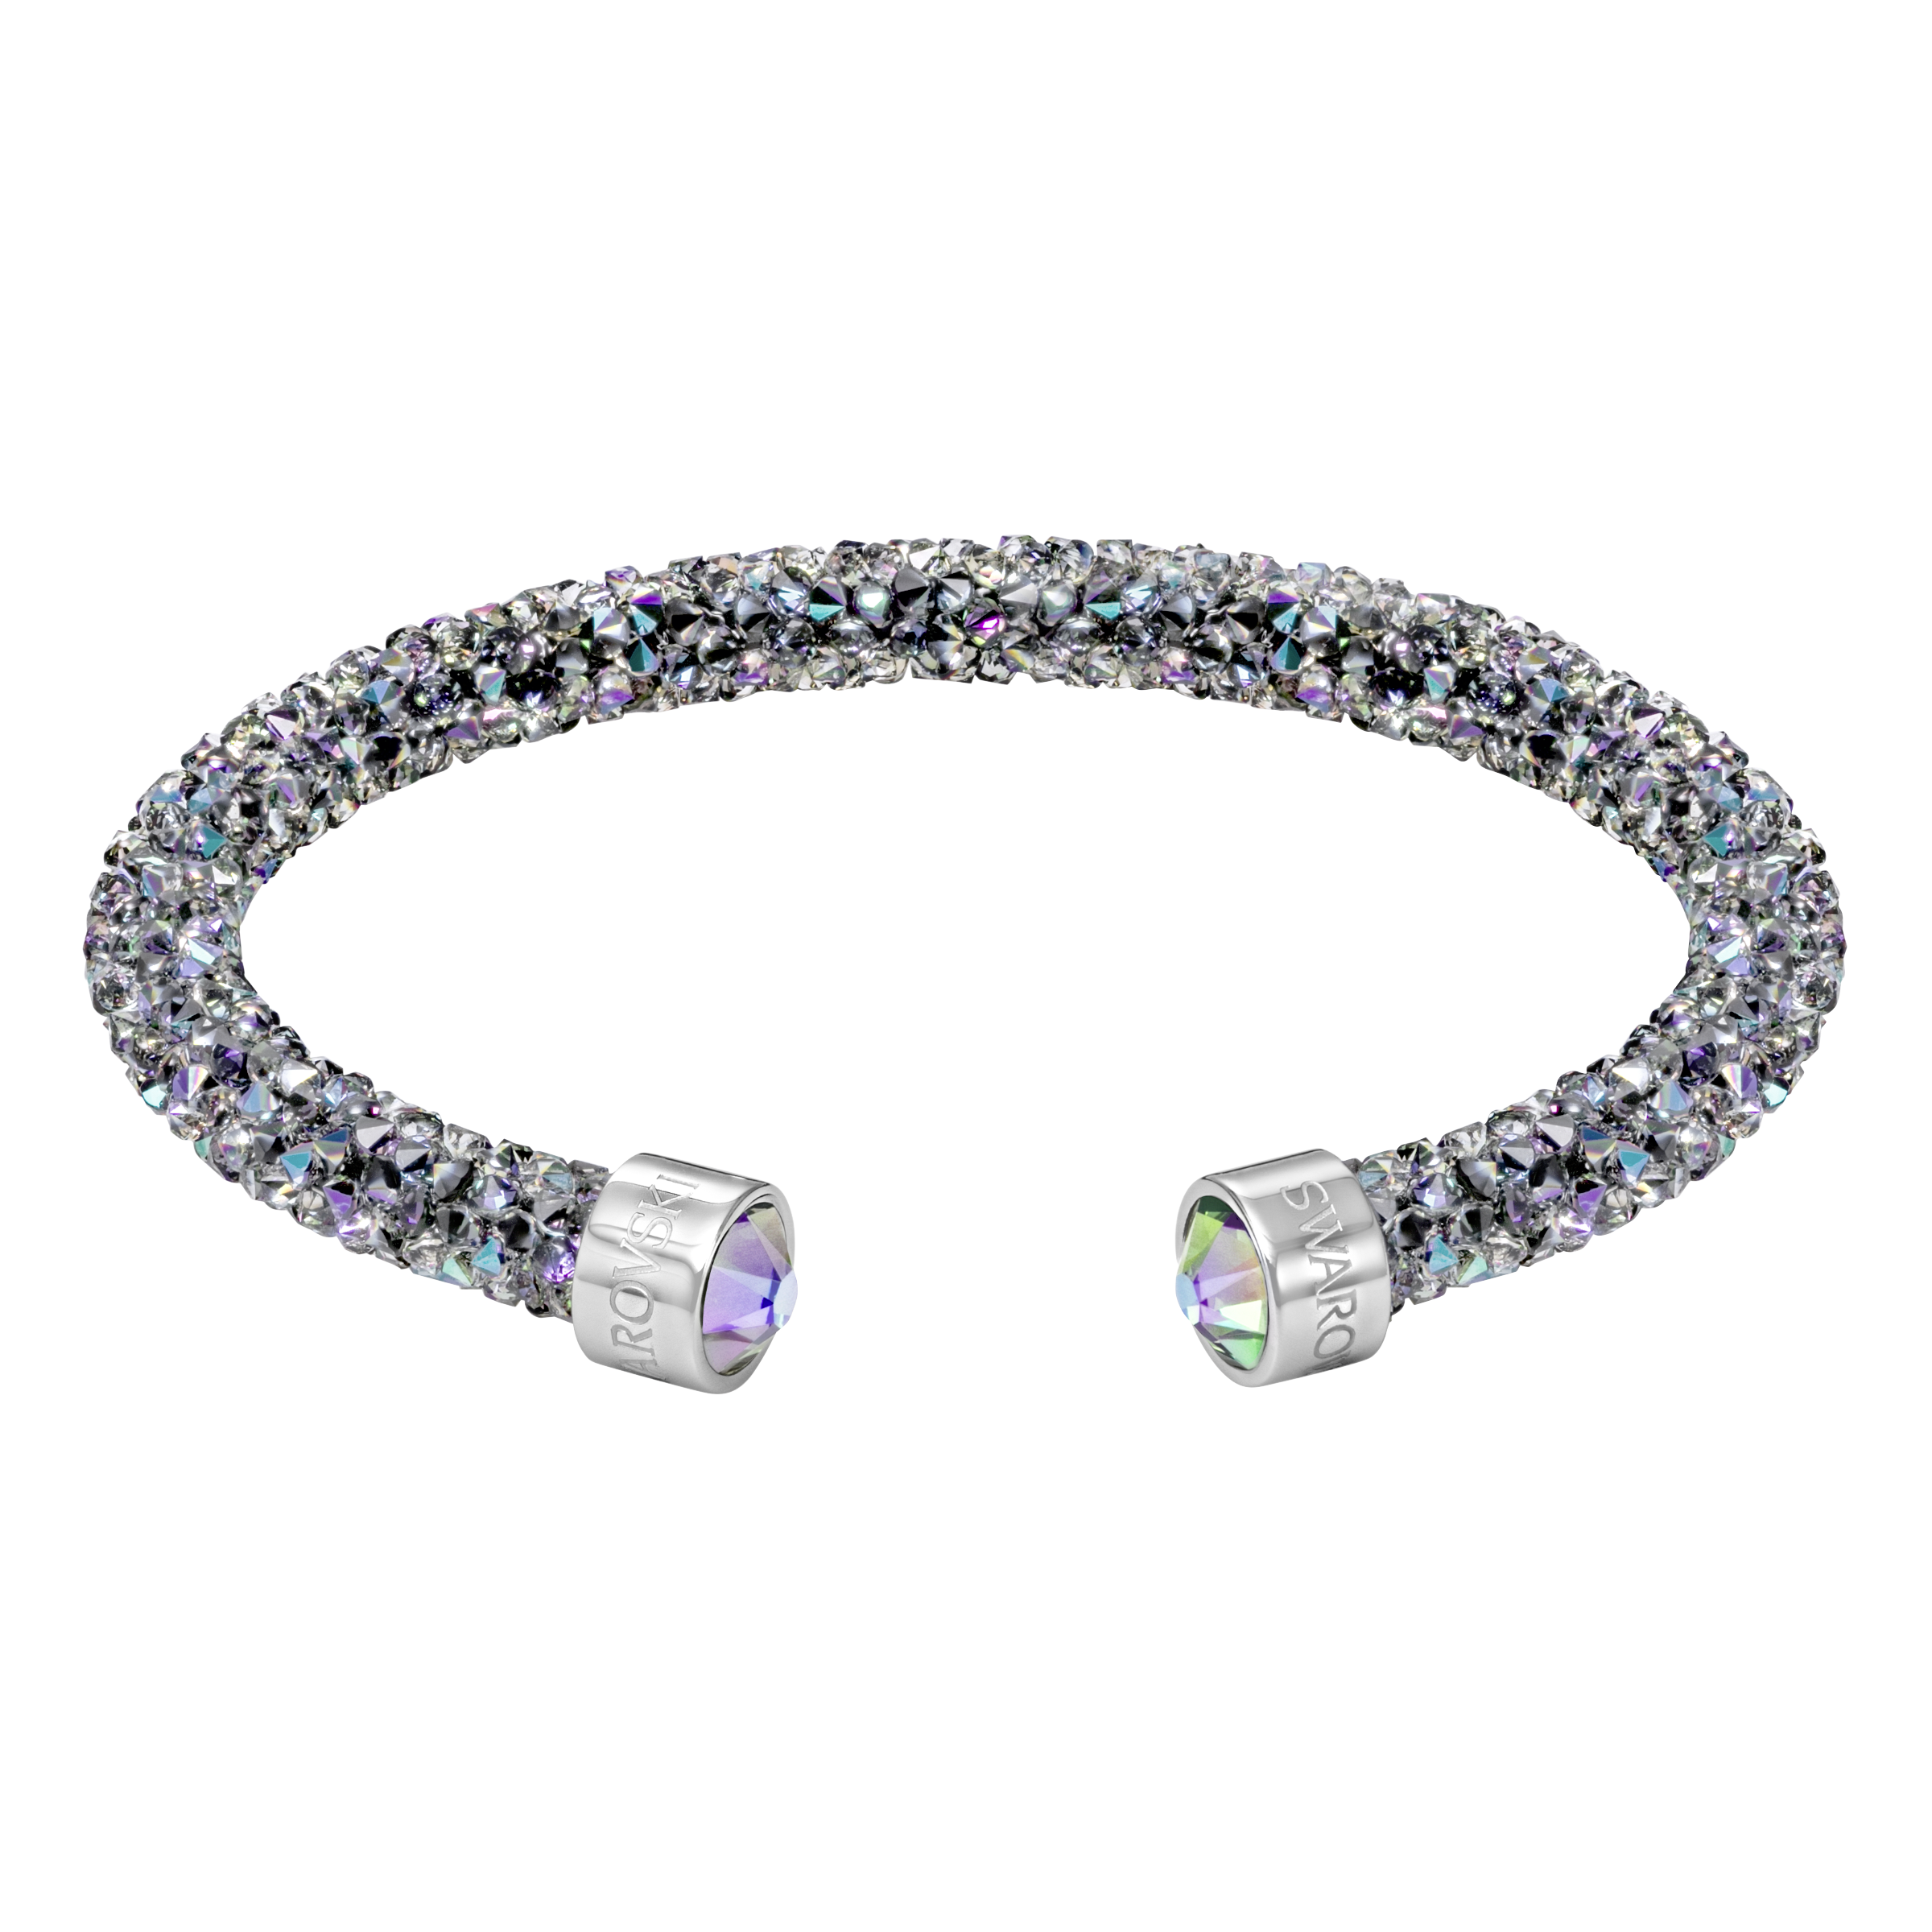 Crystaldust Cuff, Multi-colored, Stainless steel